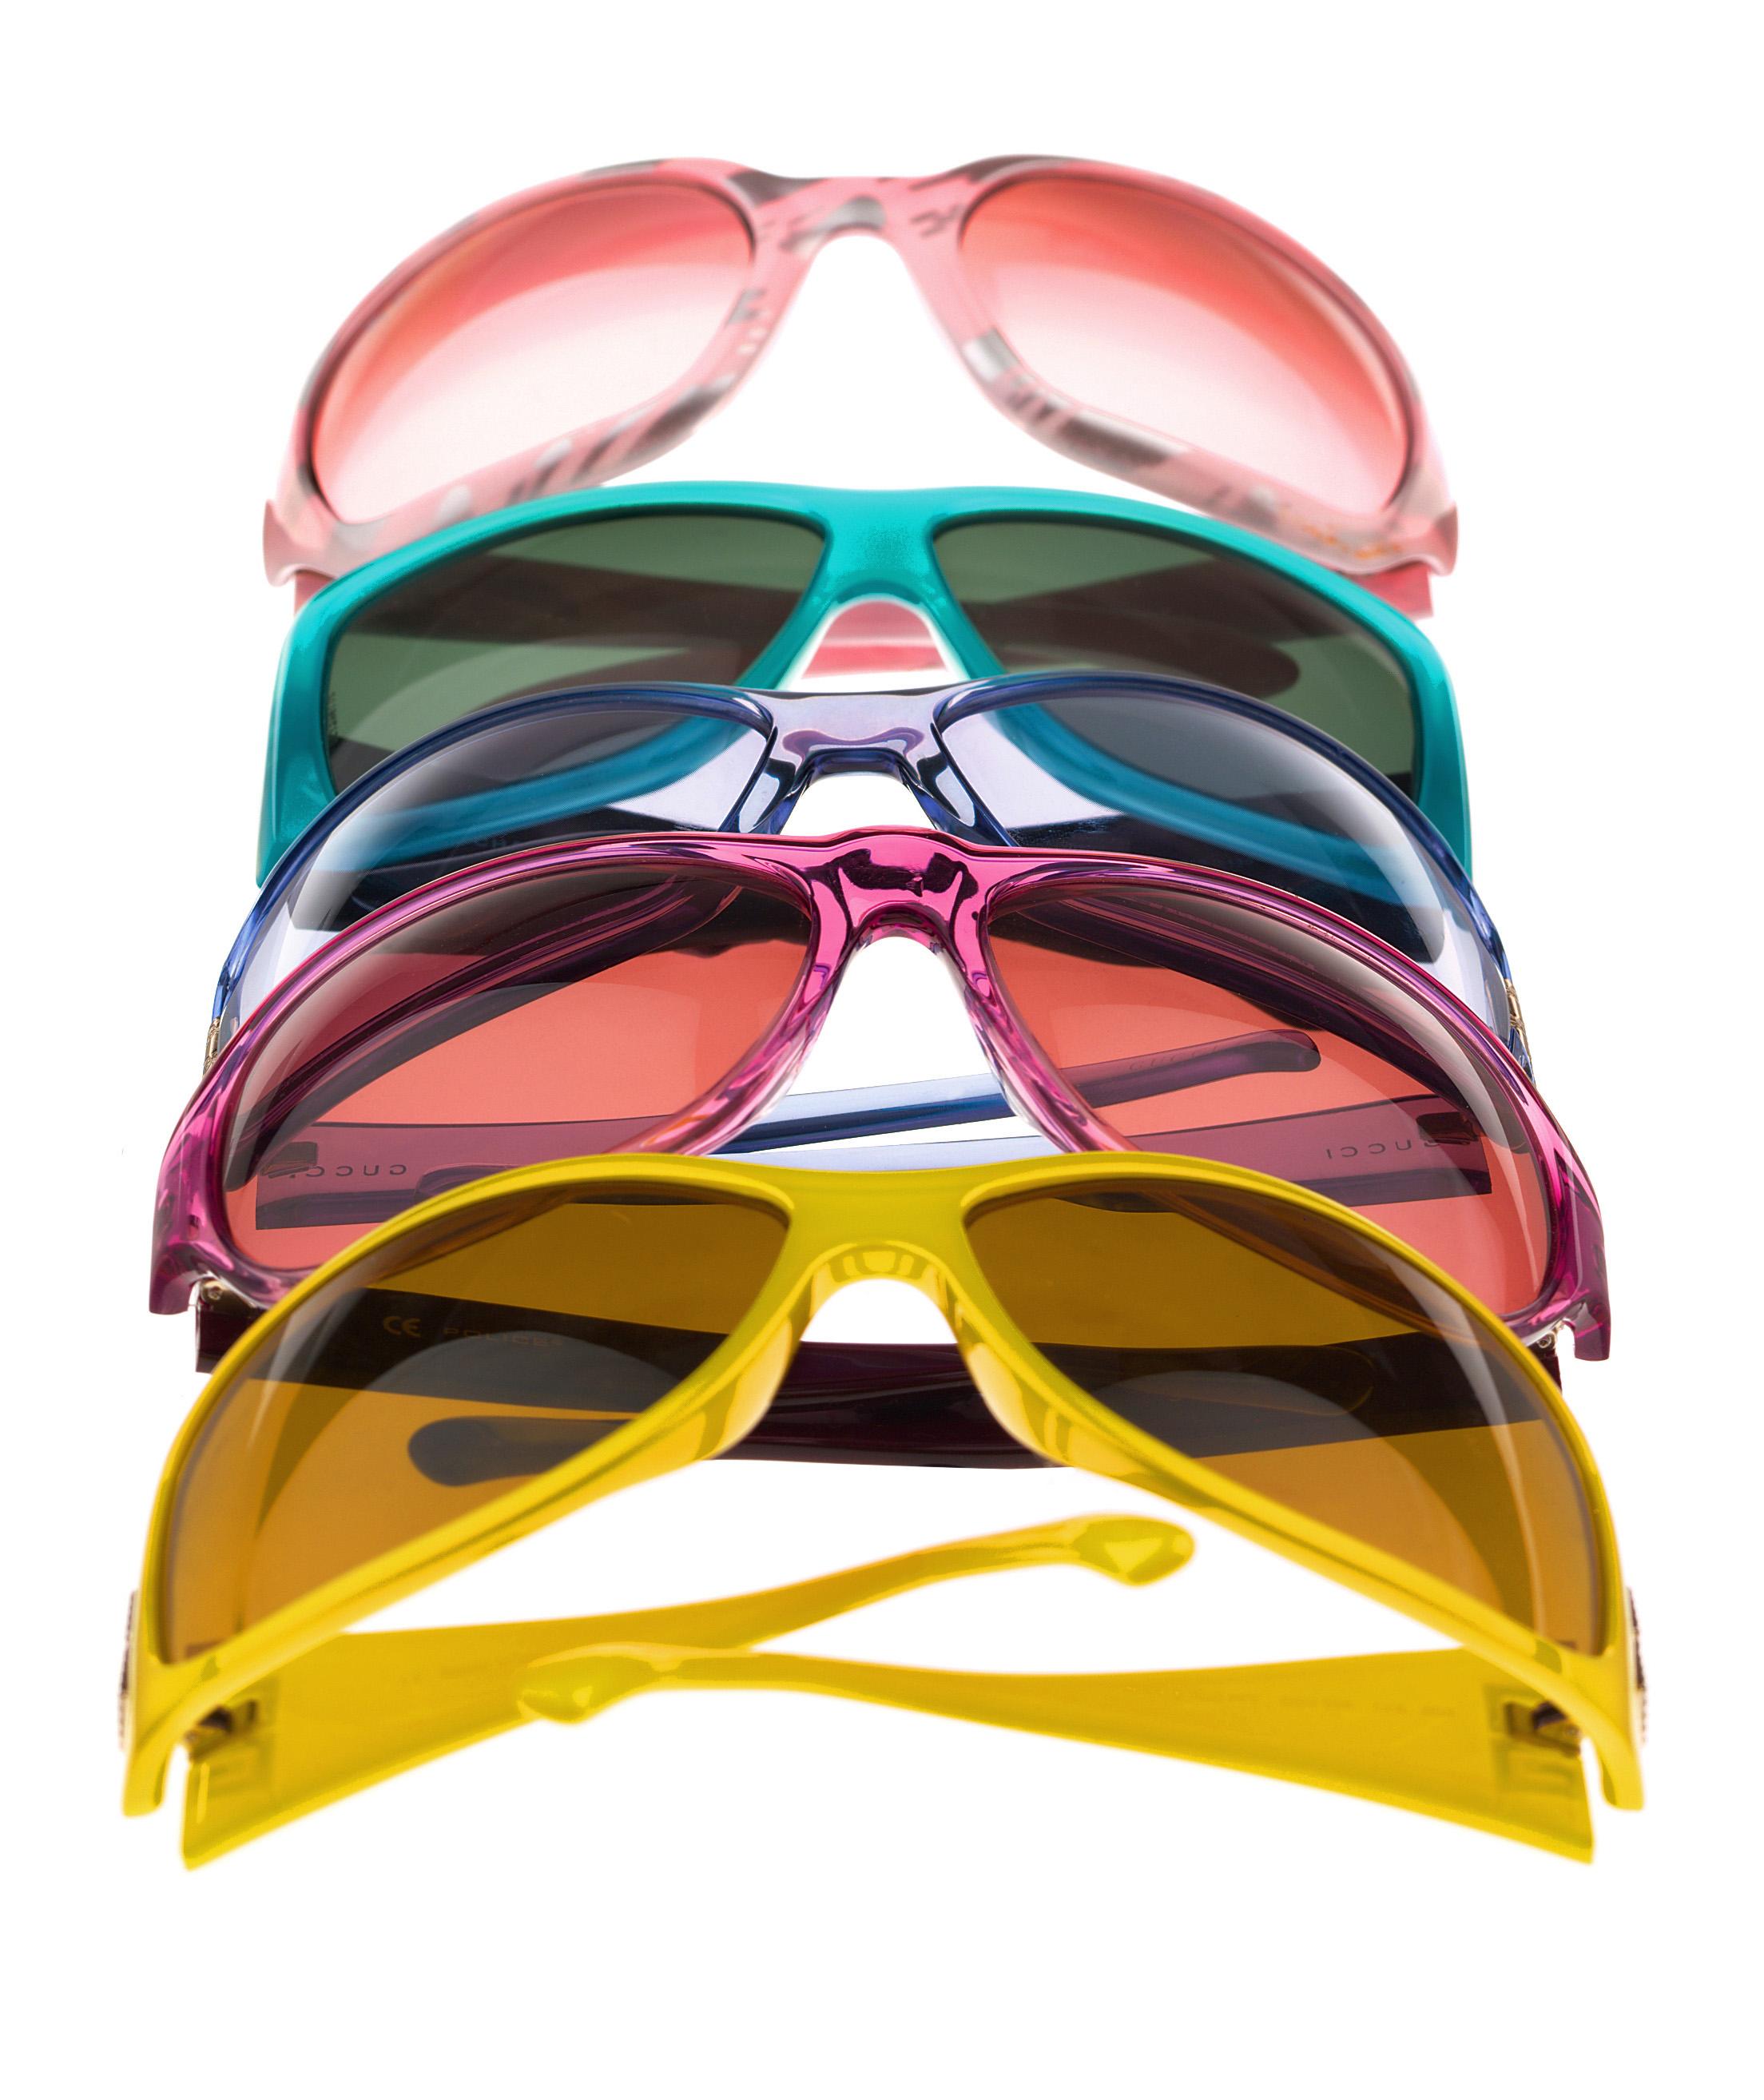 sunglasses_c 2.jpg